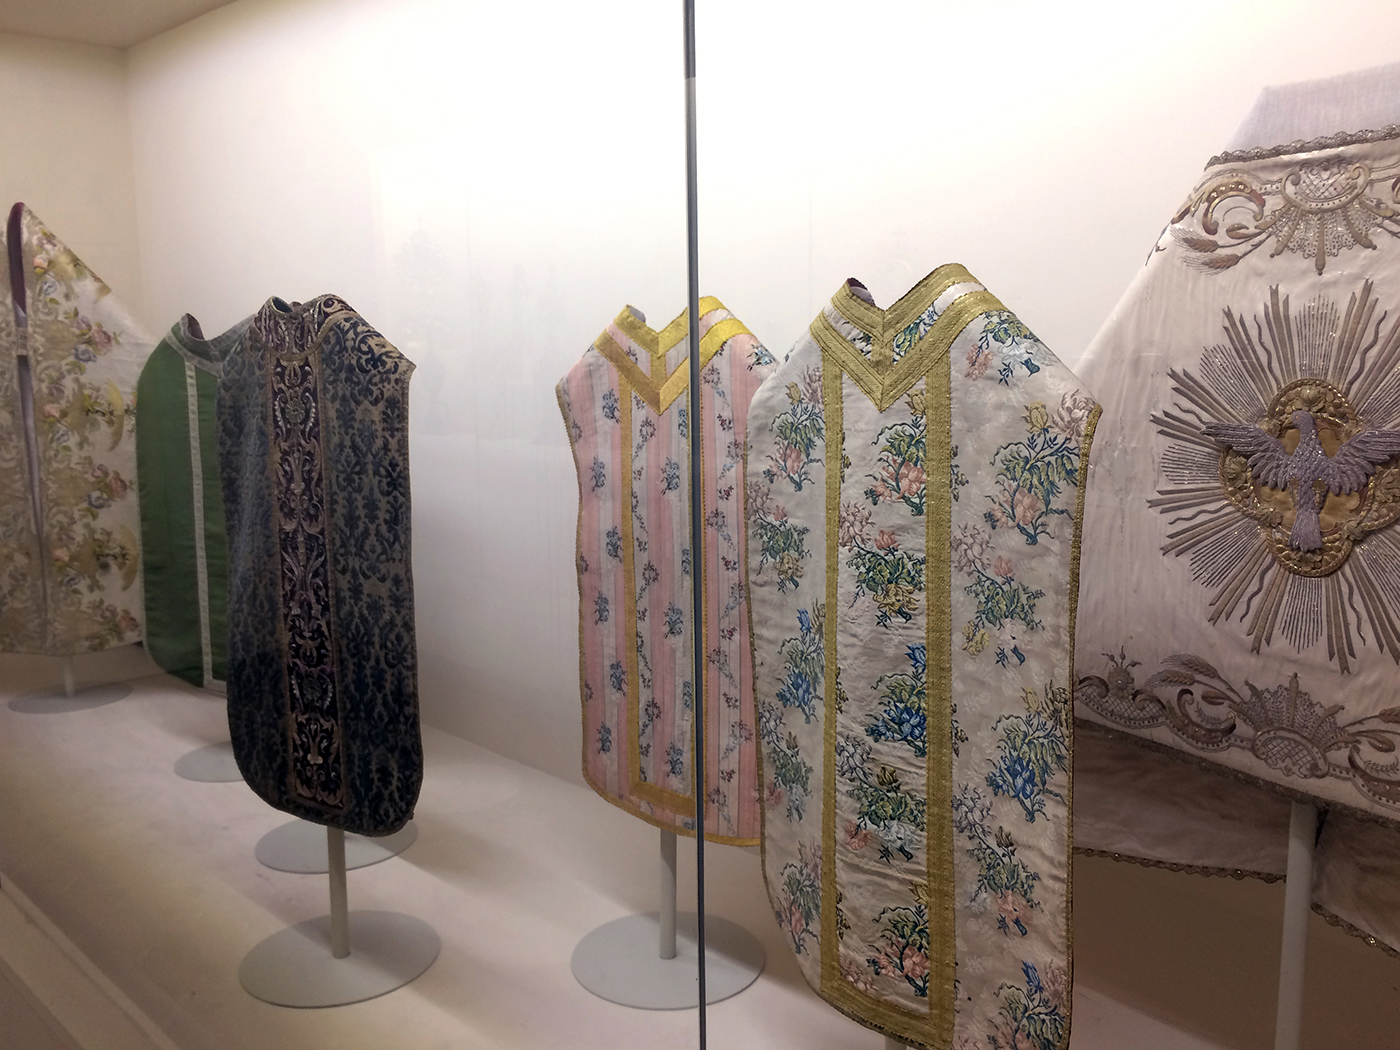 pianete del museo d'arte sacra